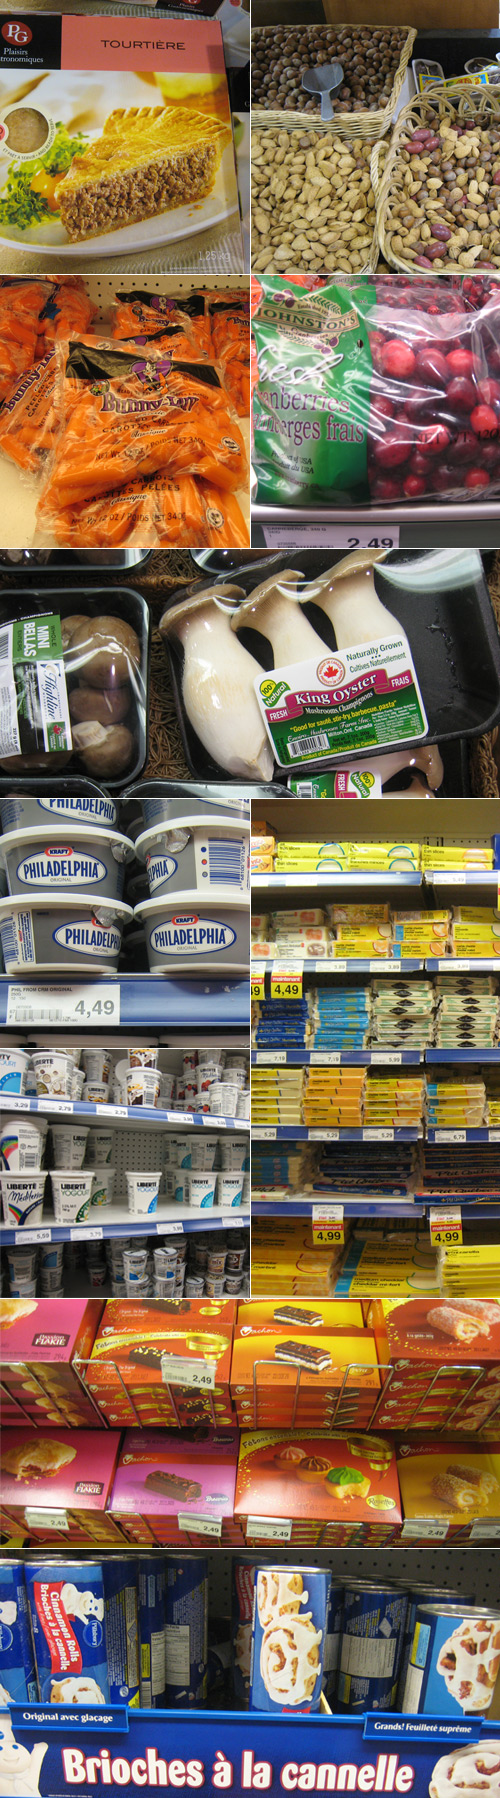 Photos de produits dans un Provigo au Québec